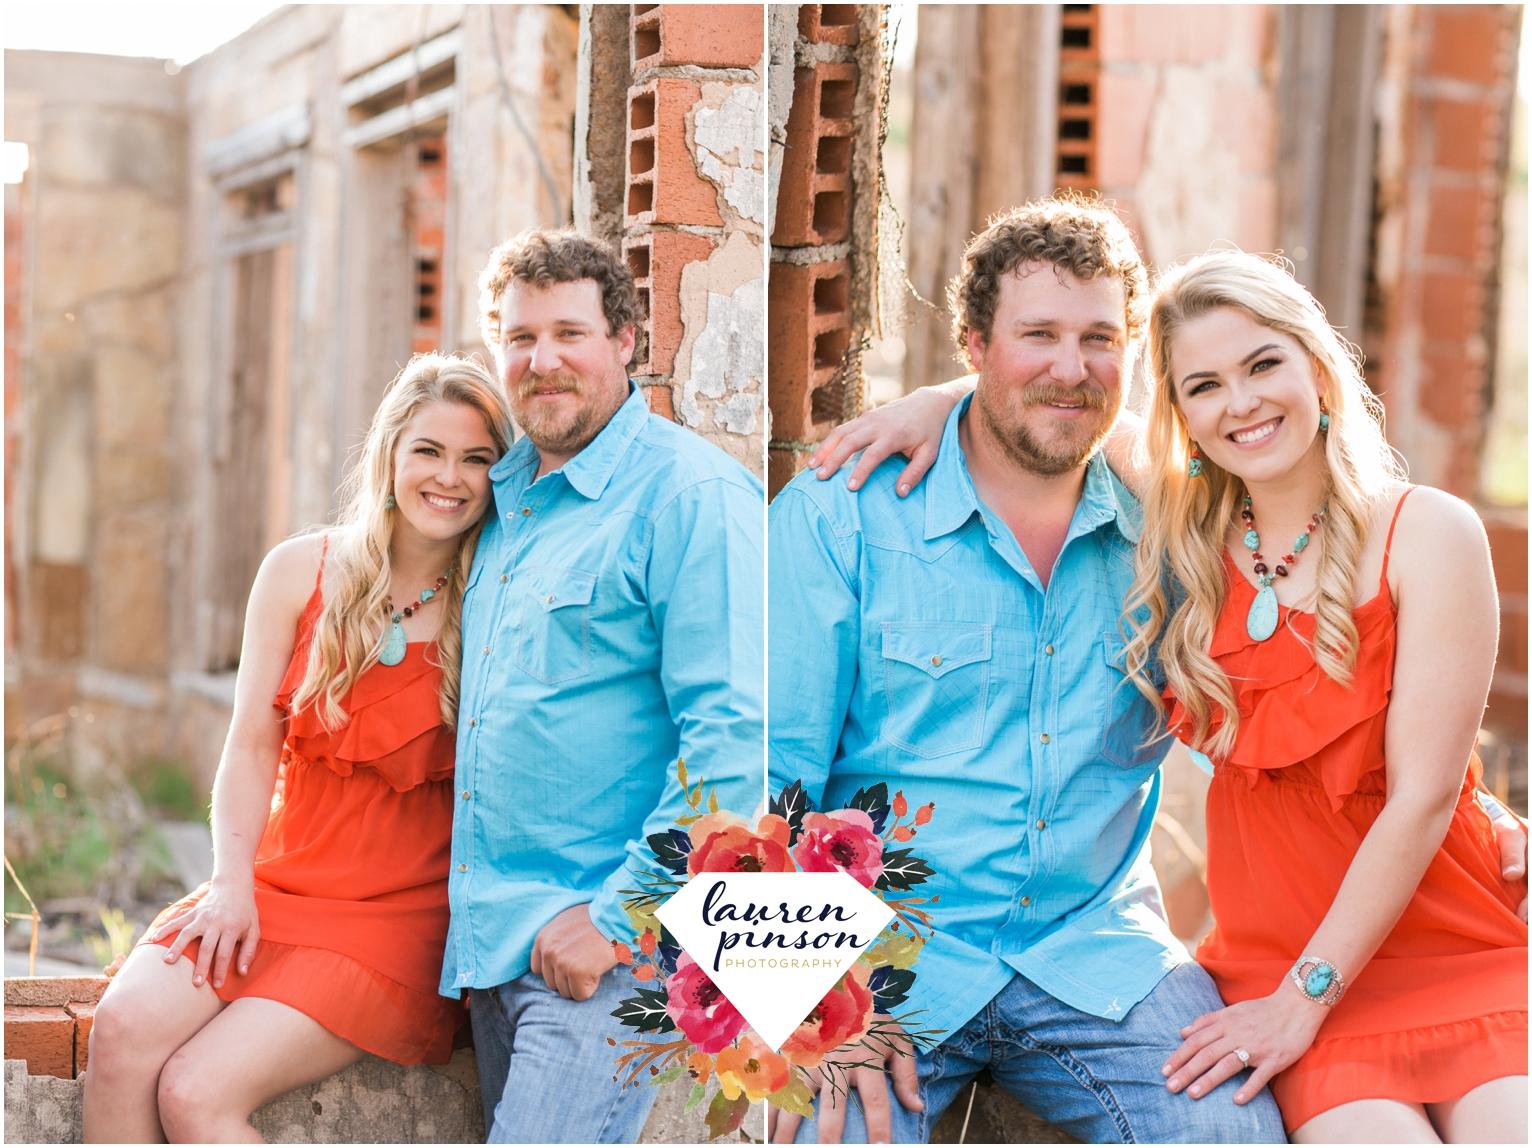 wichita-falls-wedding-photographer-engagement-session-texas-photography-oklahoma-engagement-wedding-photography_0637.jpg